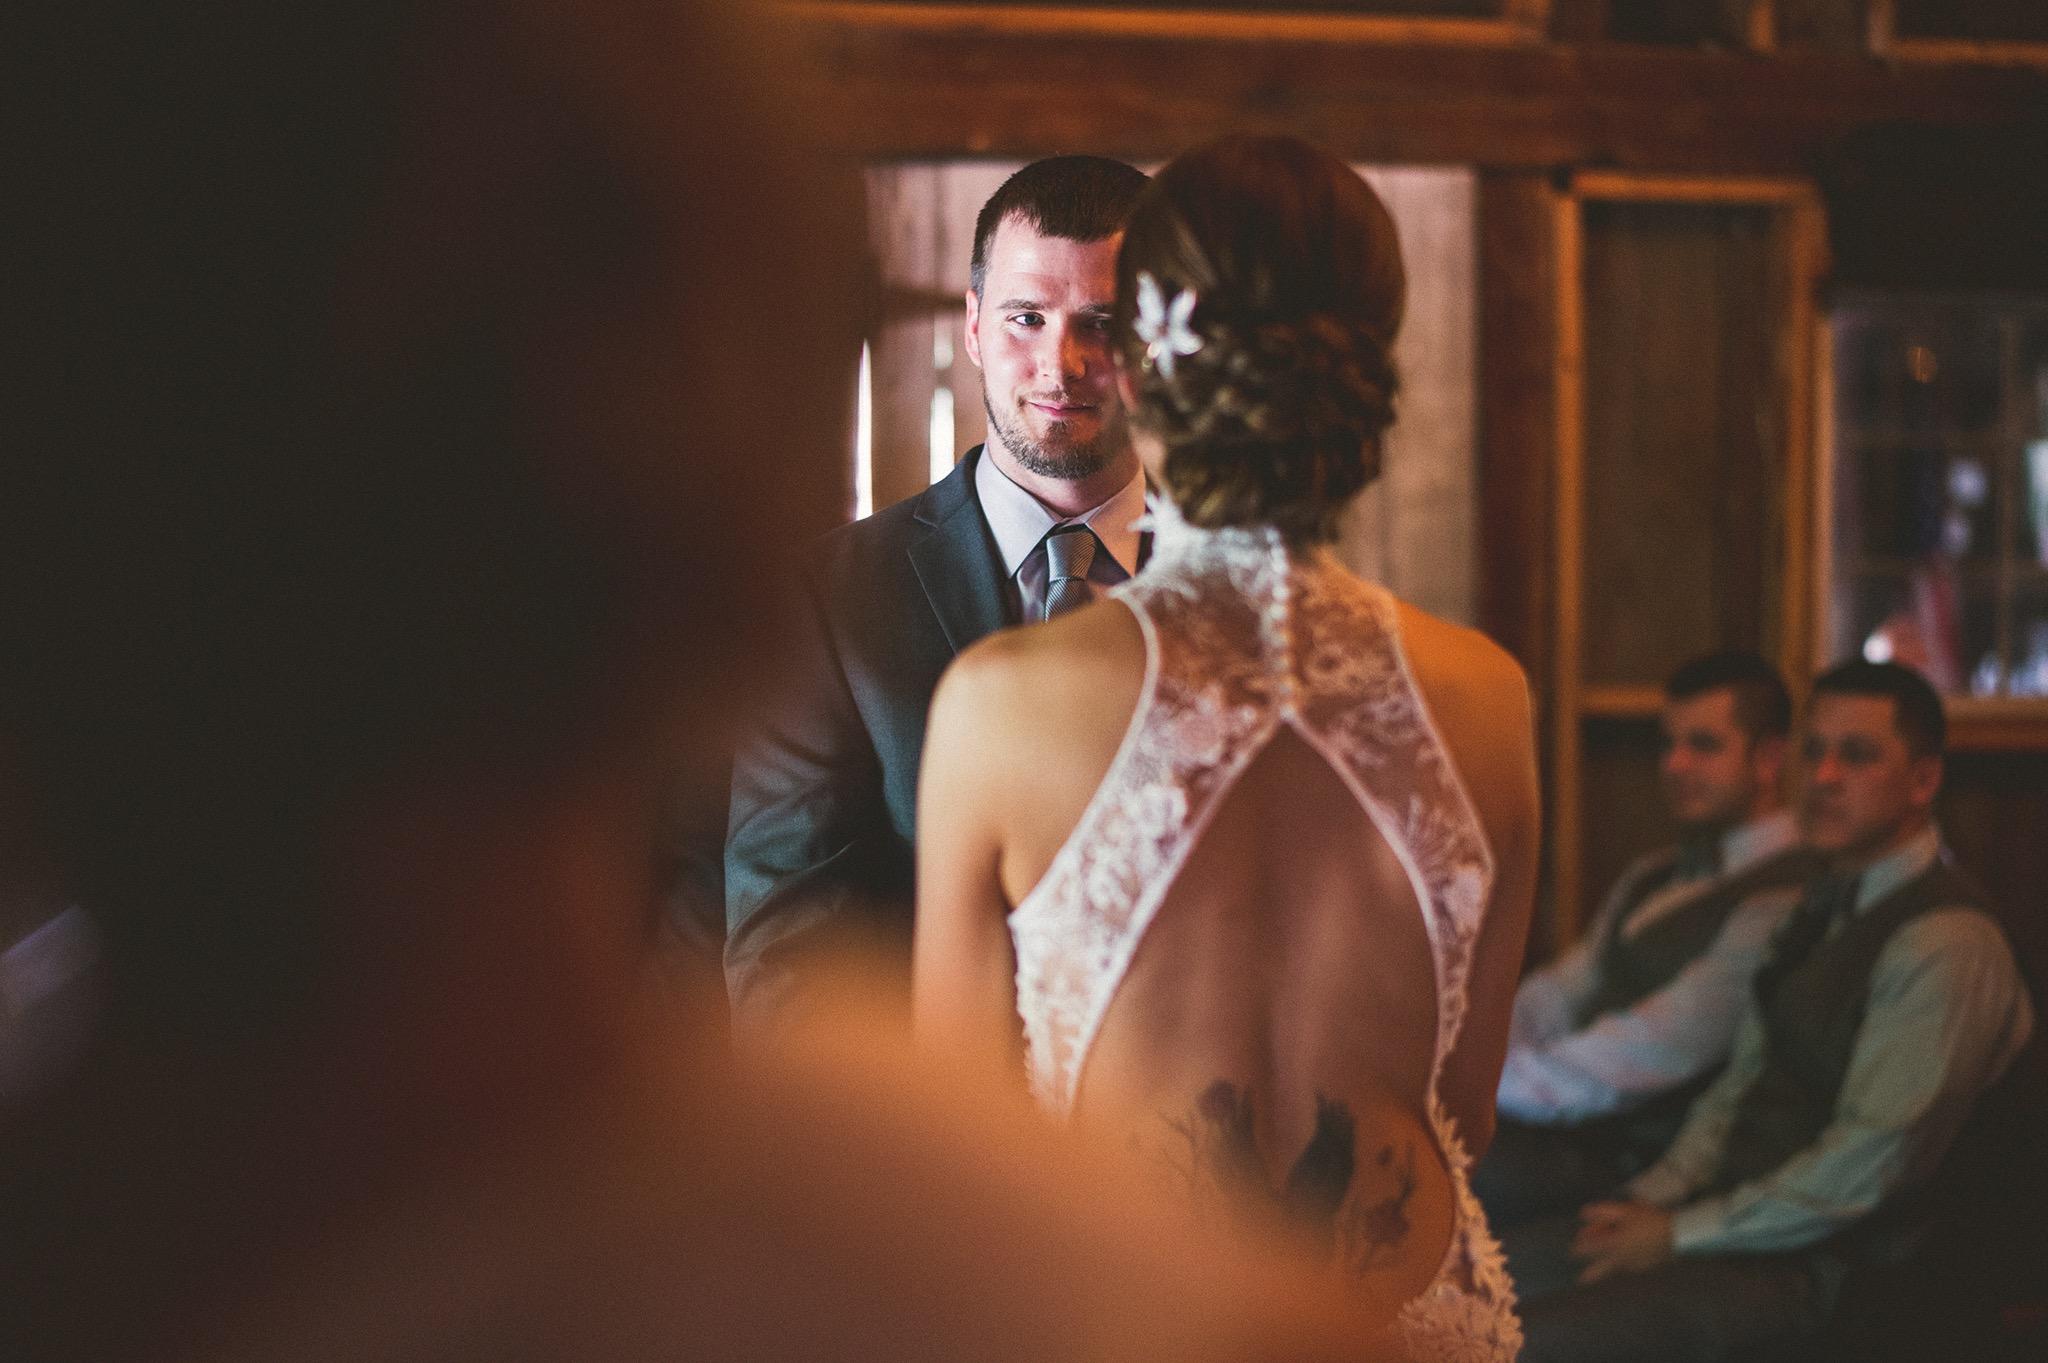 58-groom-creatice-candid.jpg